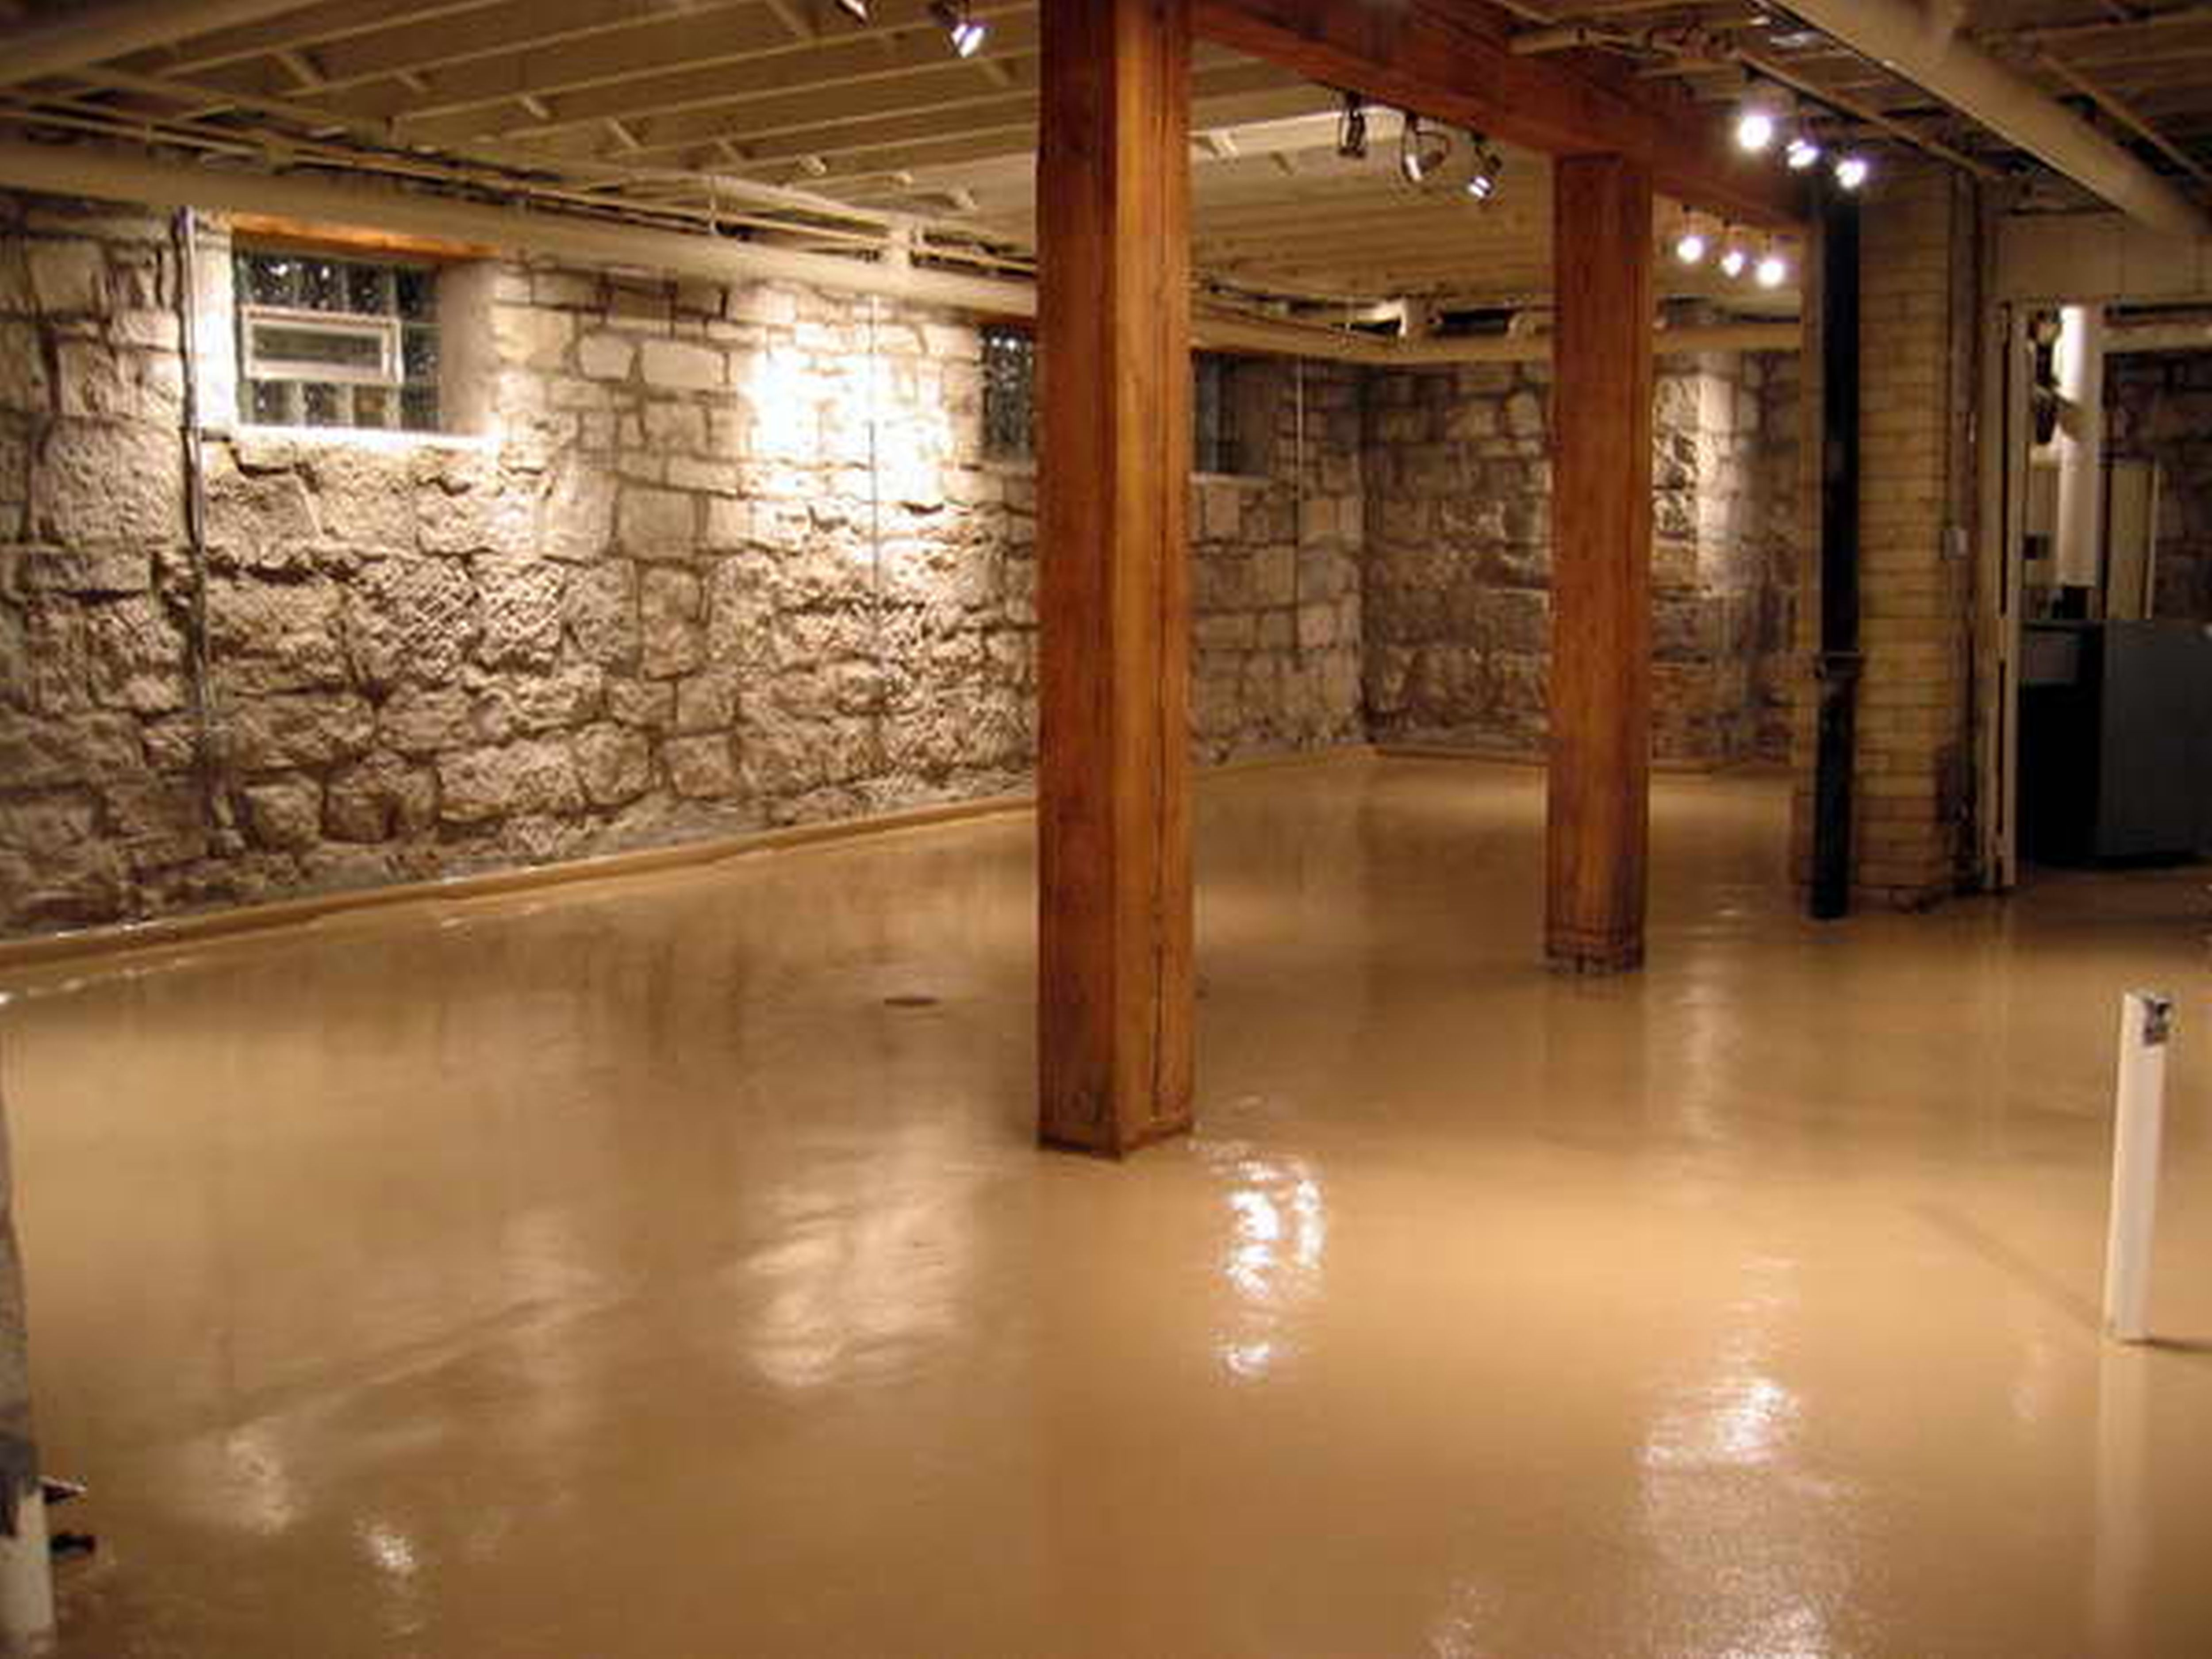 Basement Remodel Ideas Photos Style basement large basement remodel ideas provide some long seat for